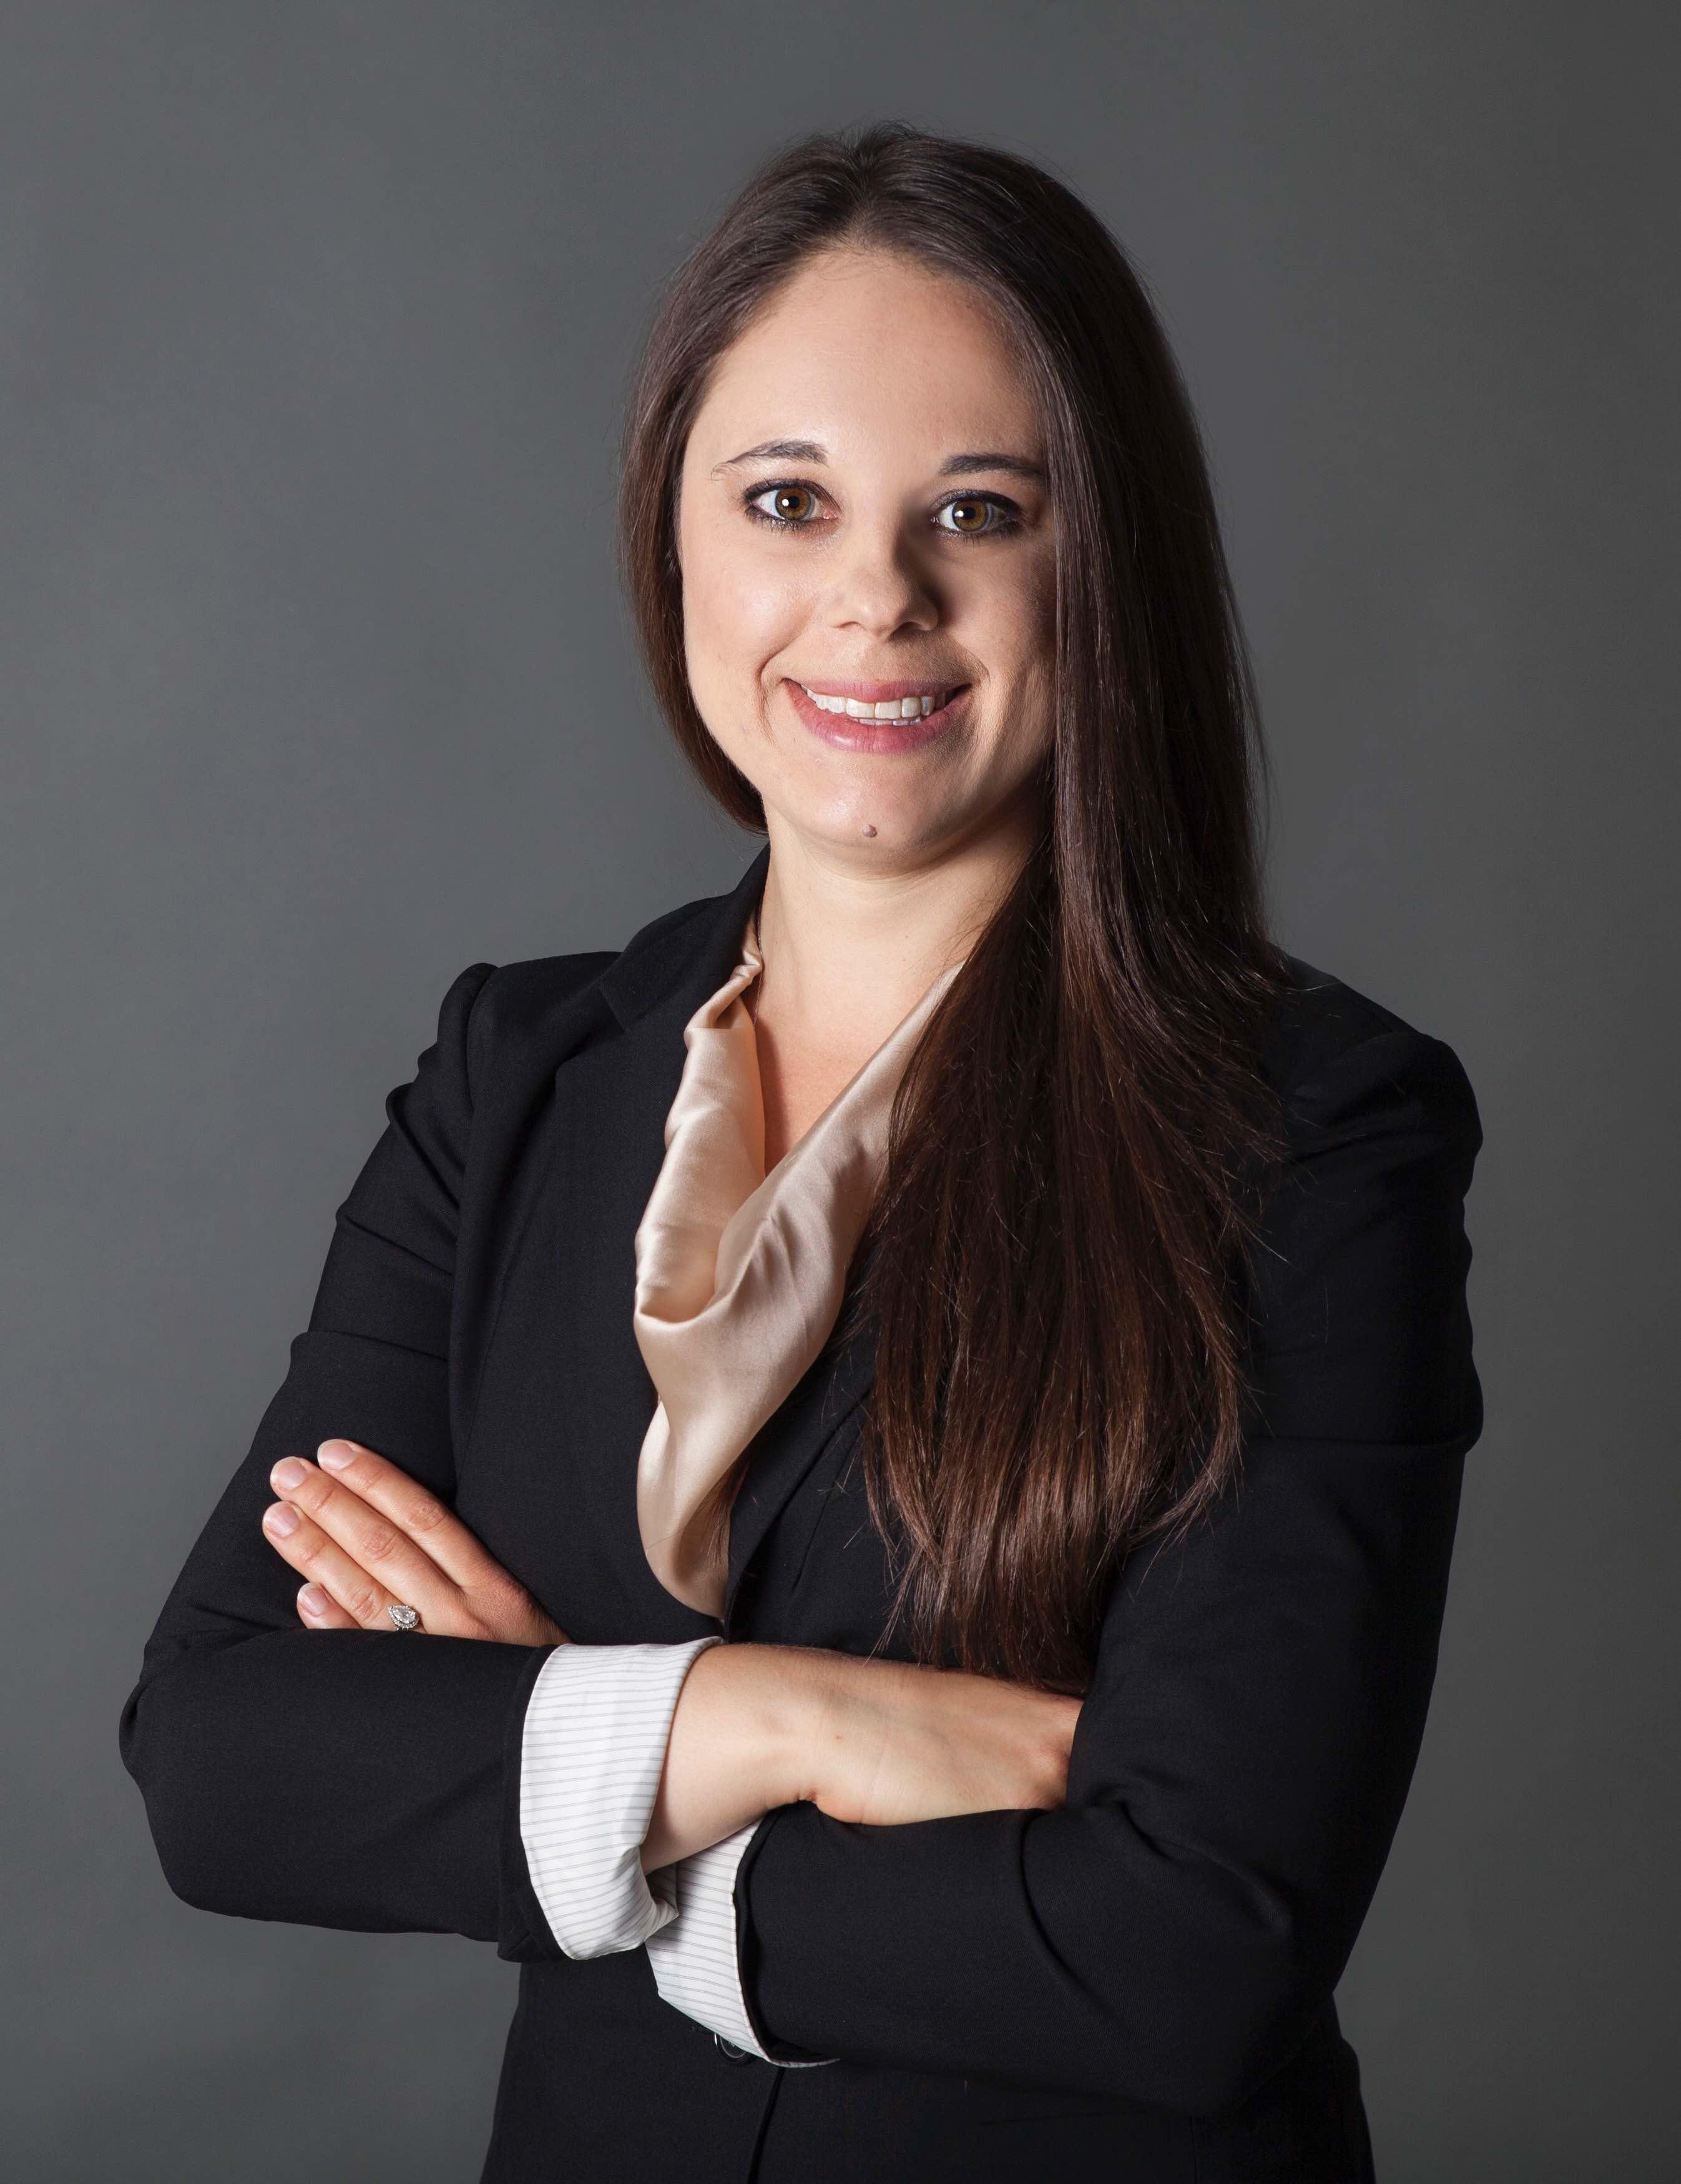 Dr. Danielle Williamson